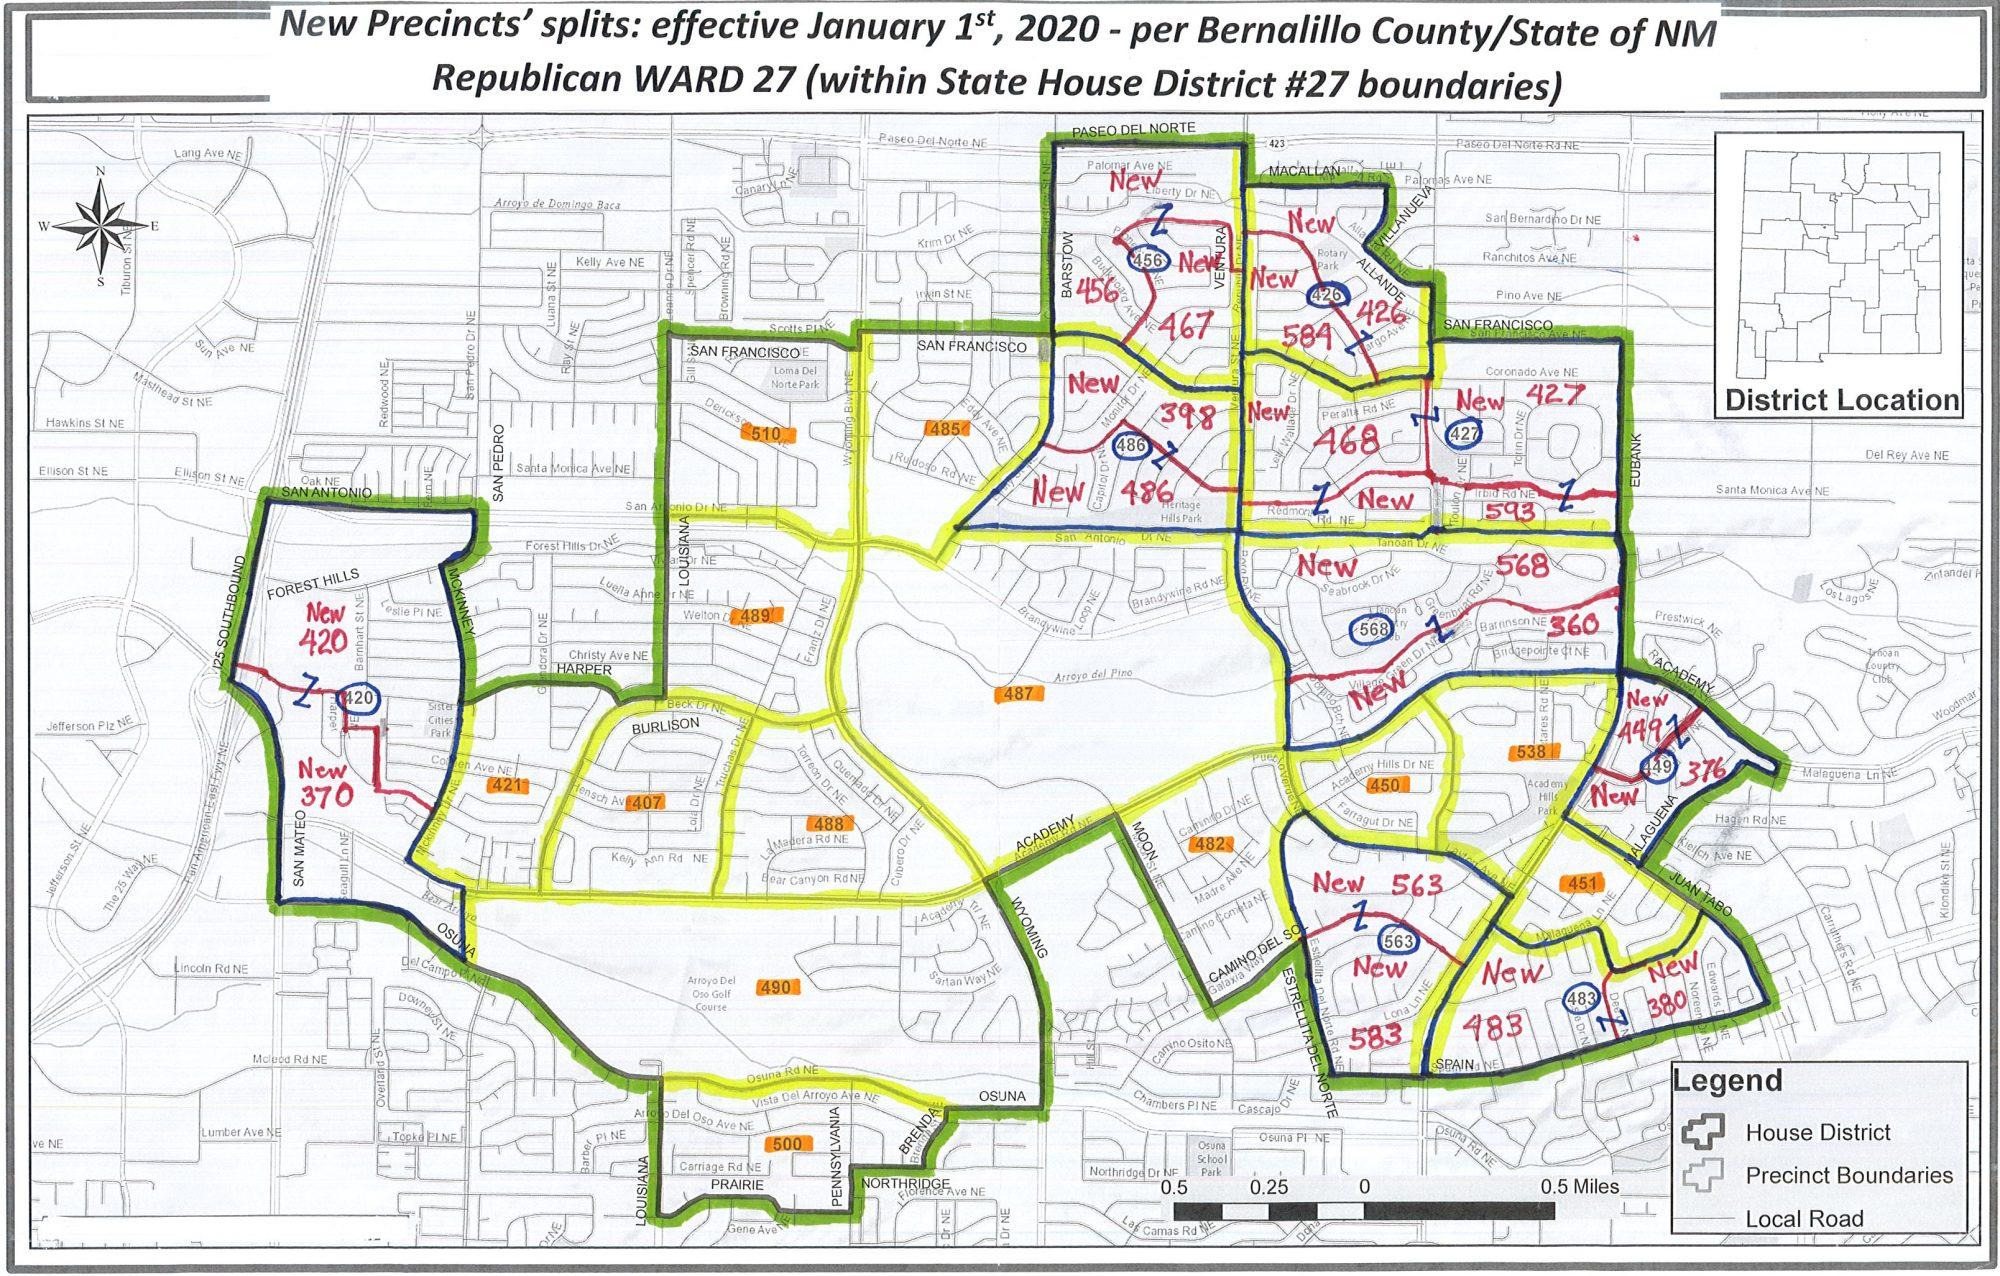 cropped-ward27precincts-newsplits2020.jpg